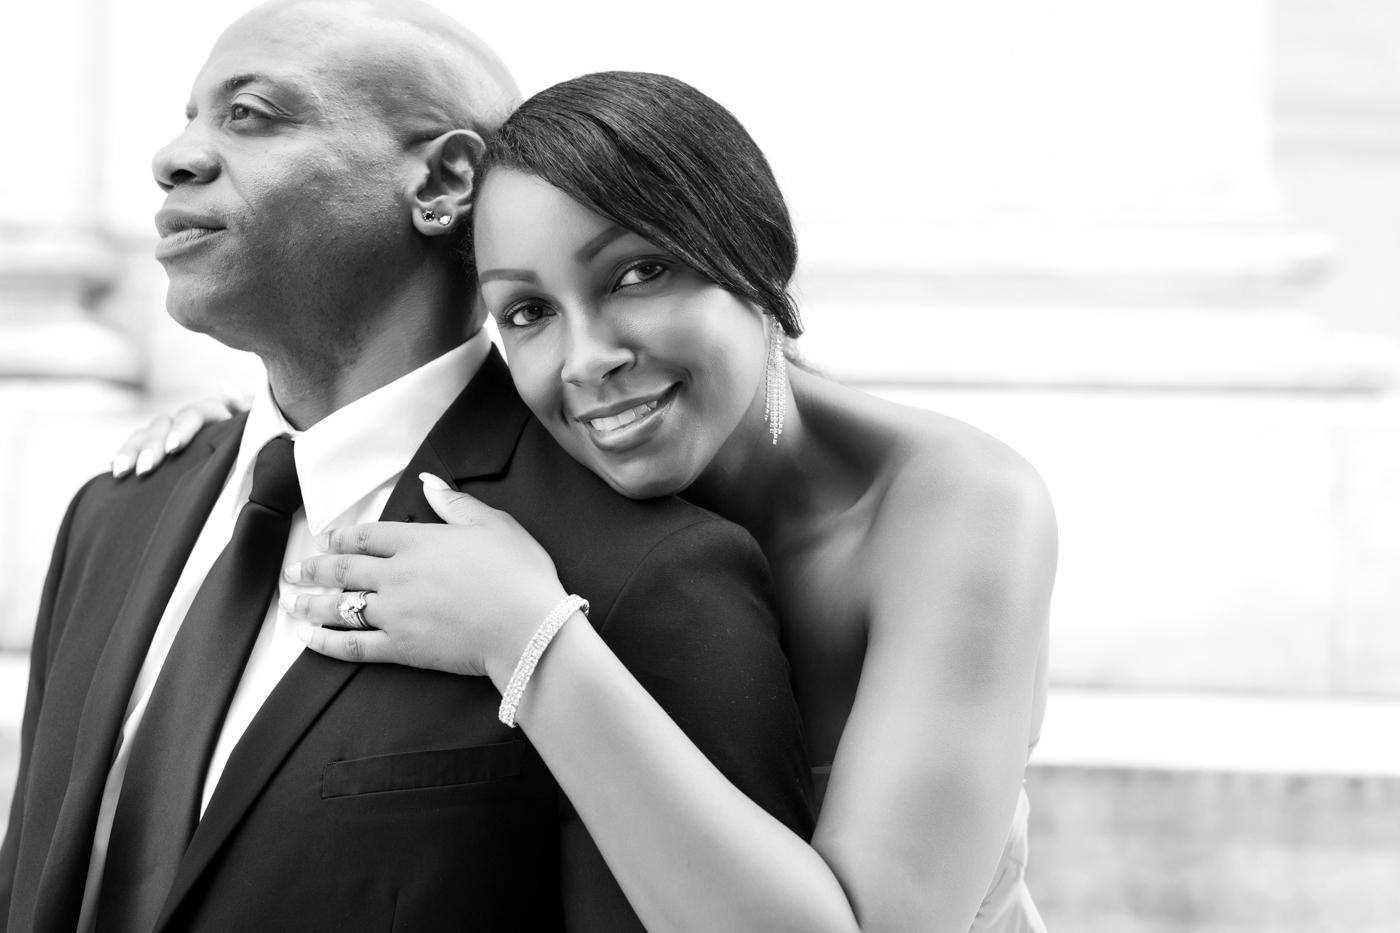 wedding-anniversary-photo-shoot-in-washington-dc-ksenia-pro-photography-33